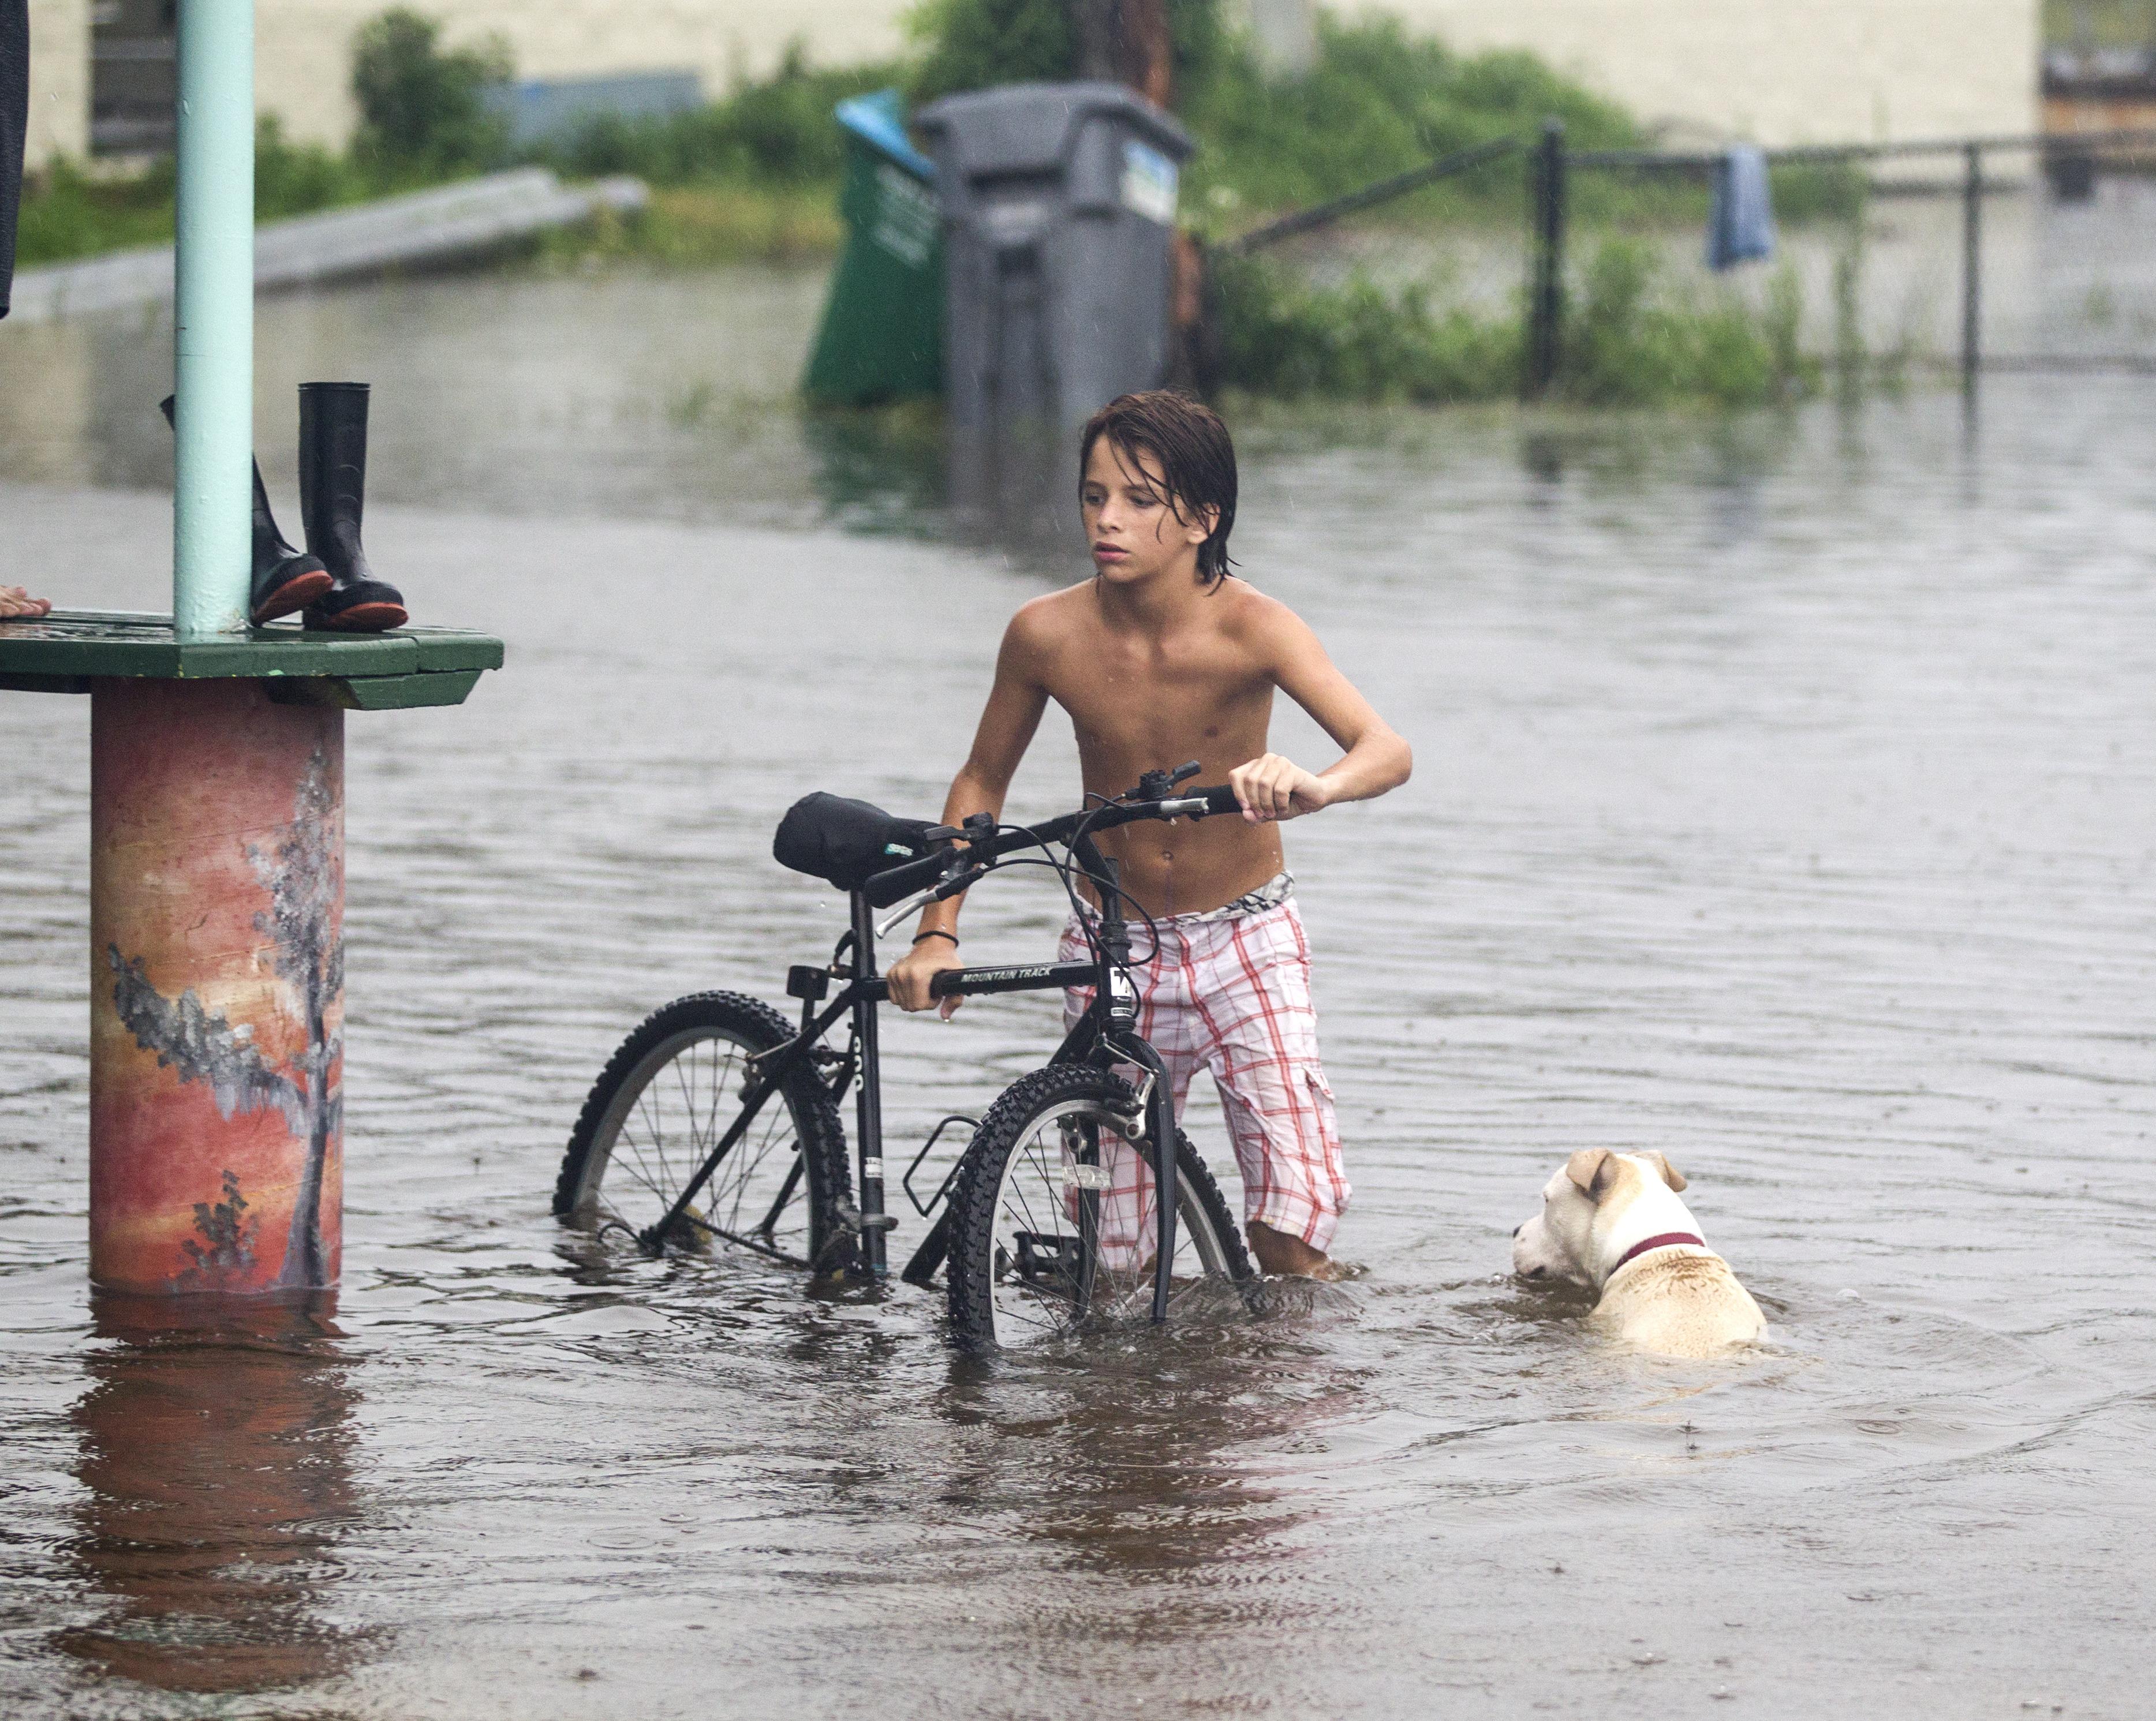 Hurricane Hermine Bears Down On Florida's Gulf Coast